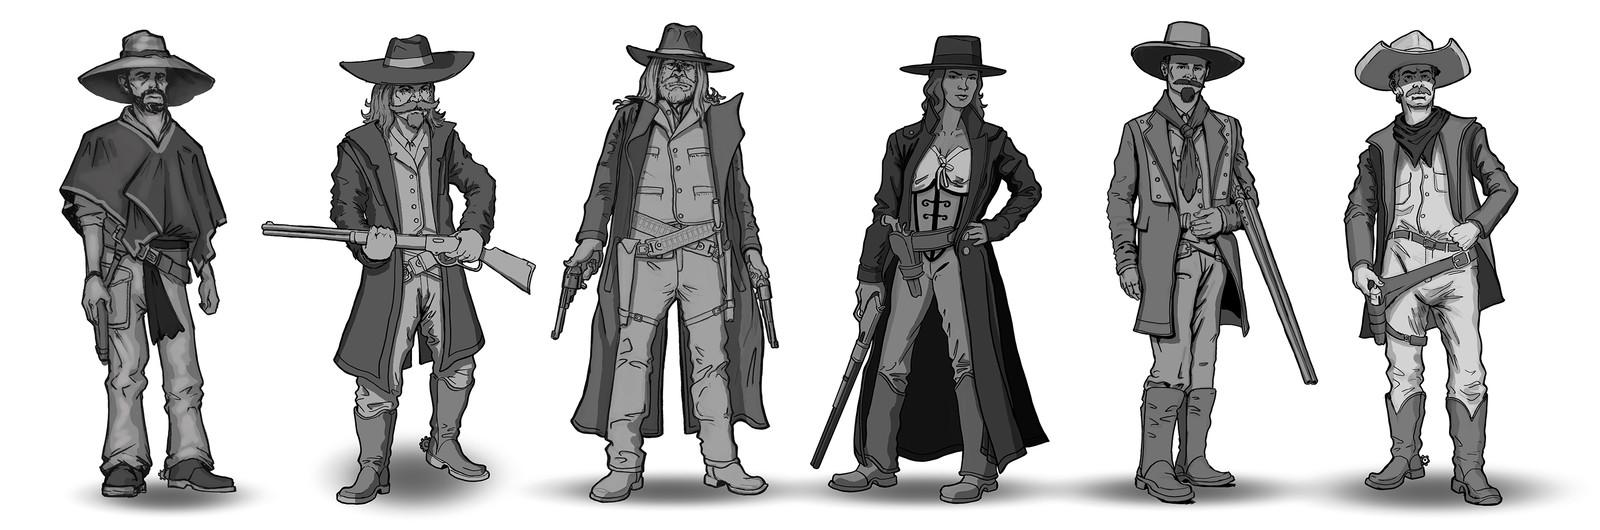 western warm up sketches